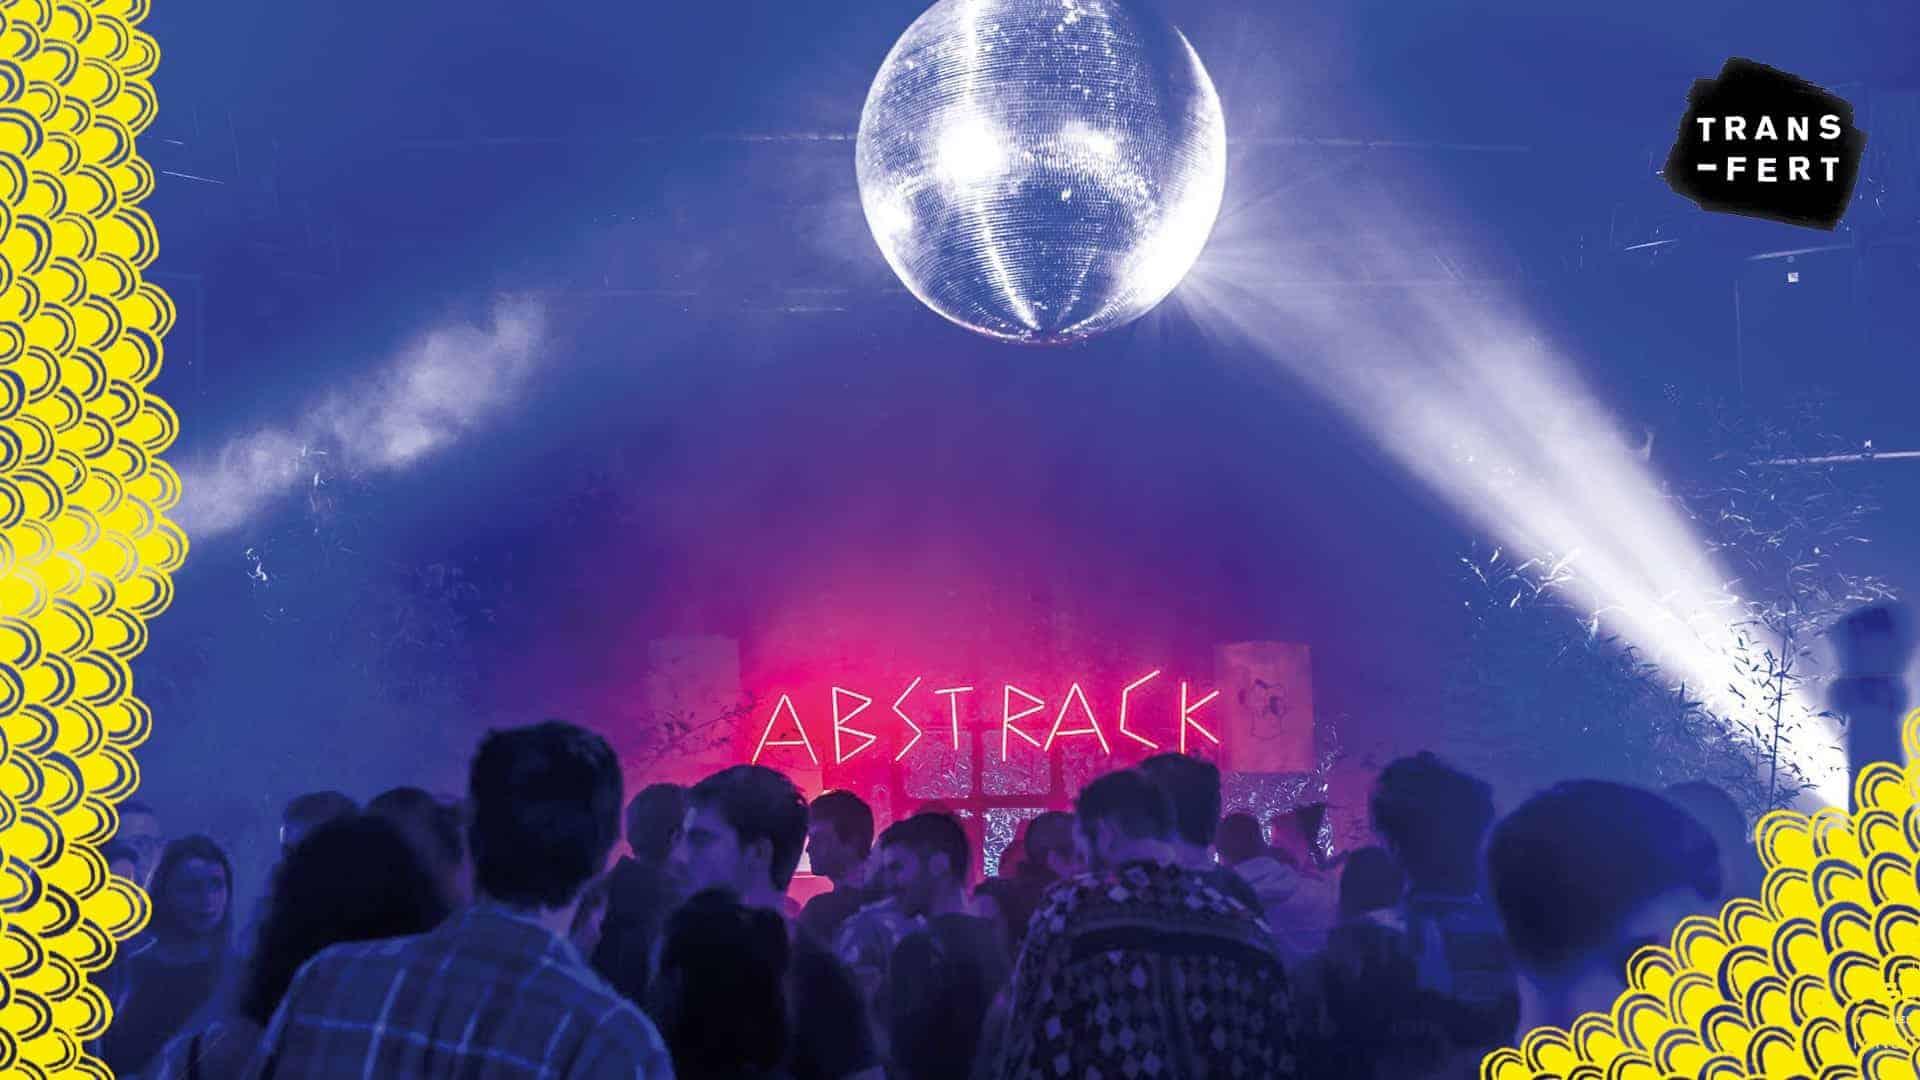 abstrack sound system transfert